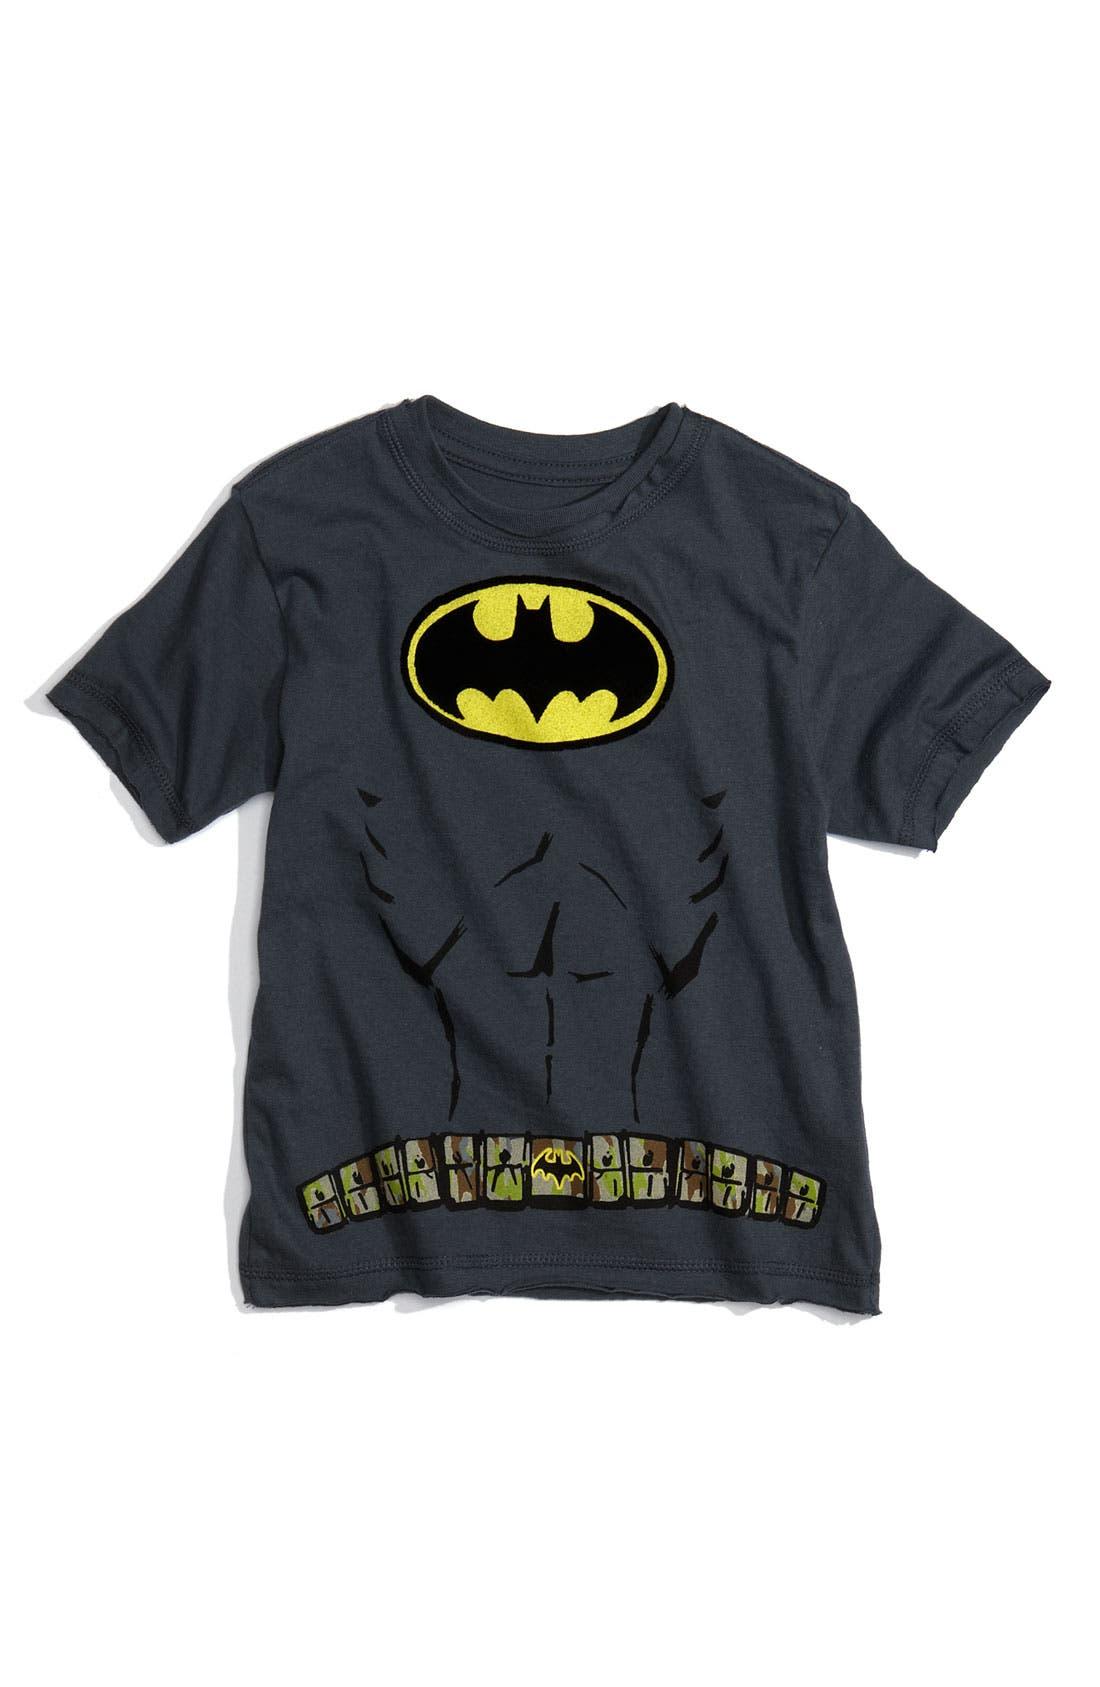 Alternate Image 1 Selected - Dx-Xtreme Super Hero T-Shirt (Toddler)